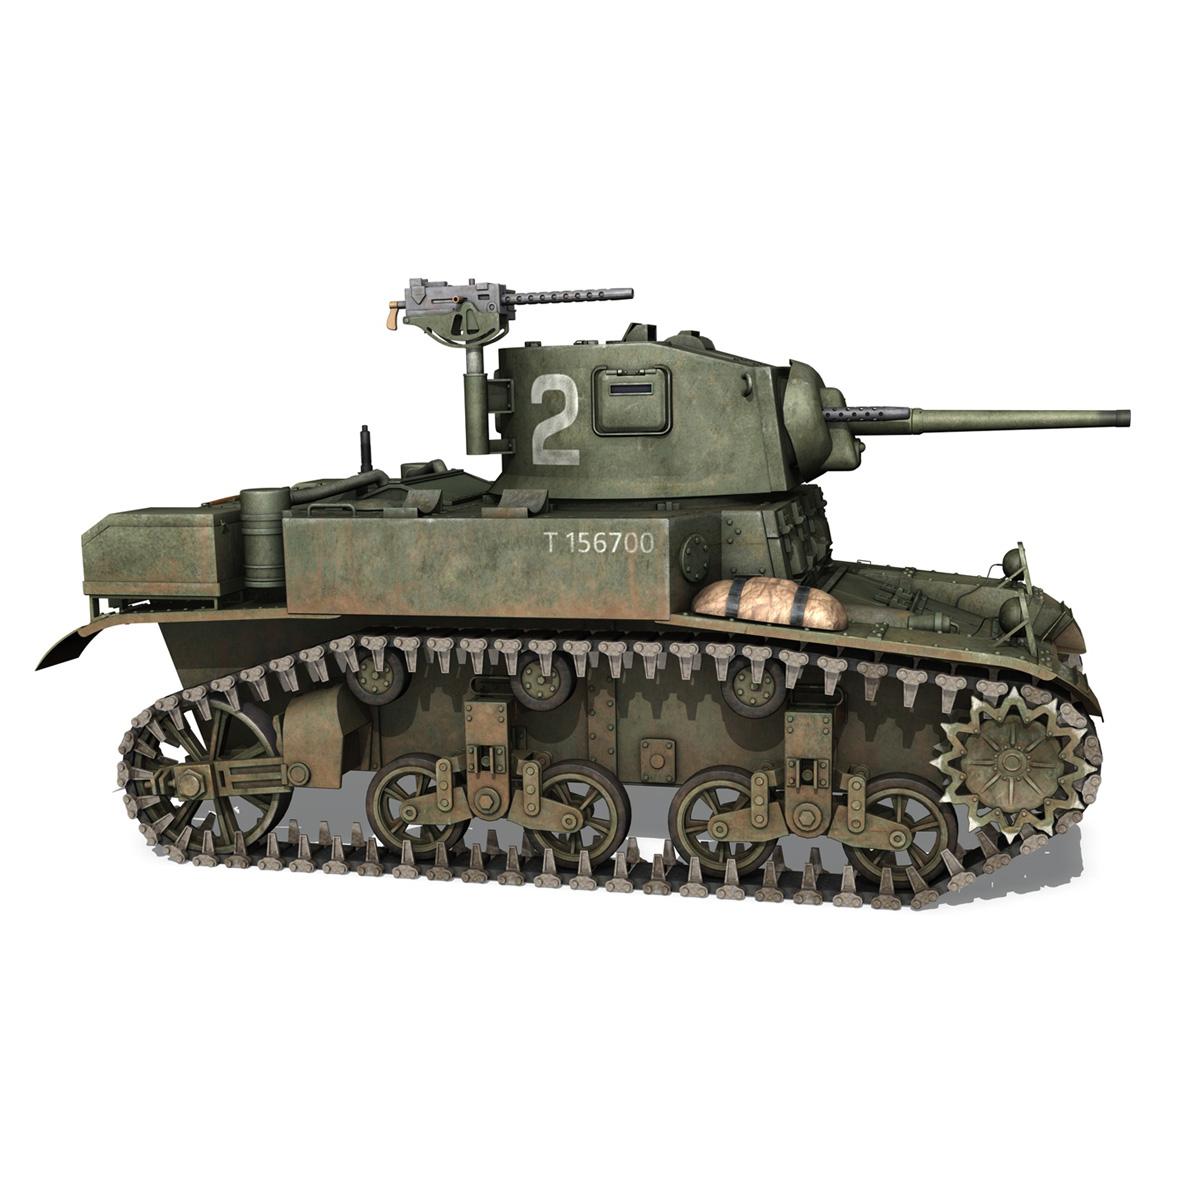 m3a1 light tank stuart – 156700 3d model c4d fbx lwo lw lws obj 3ds 265342